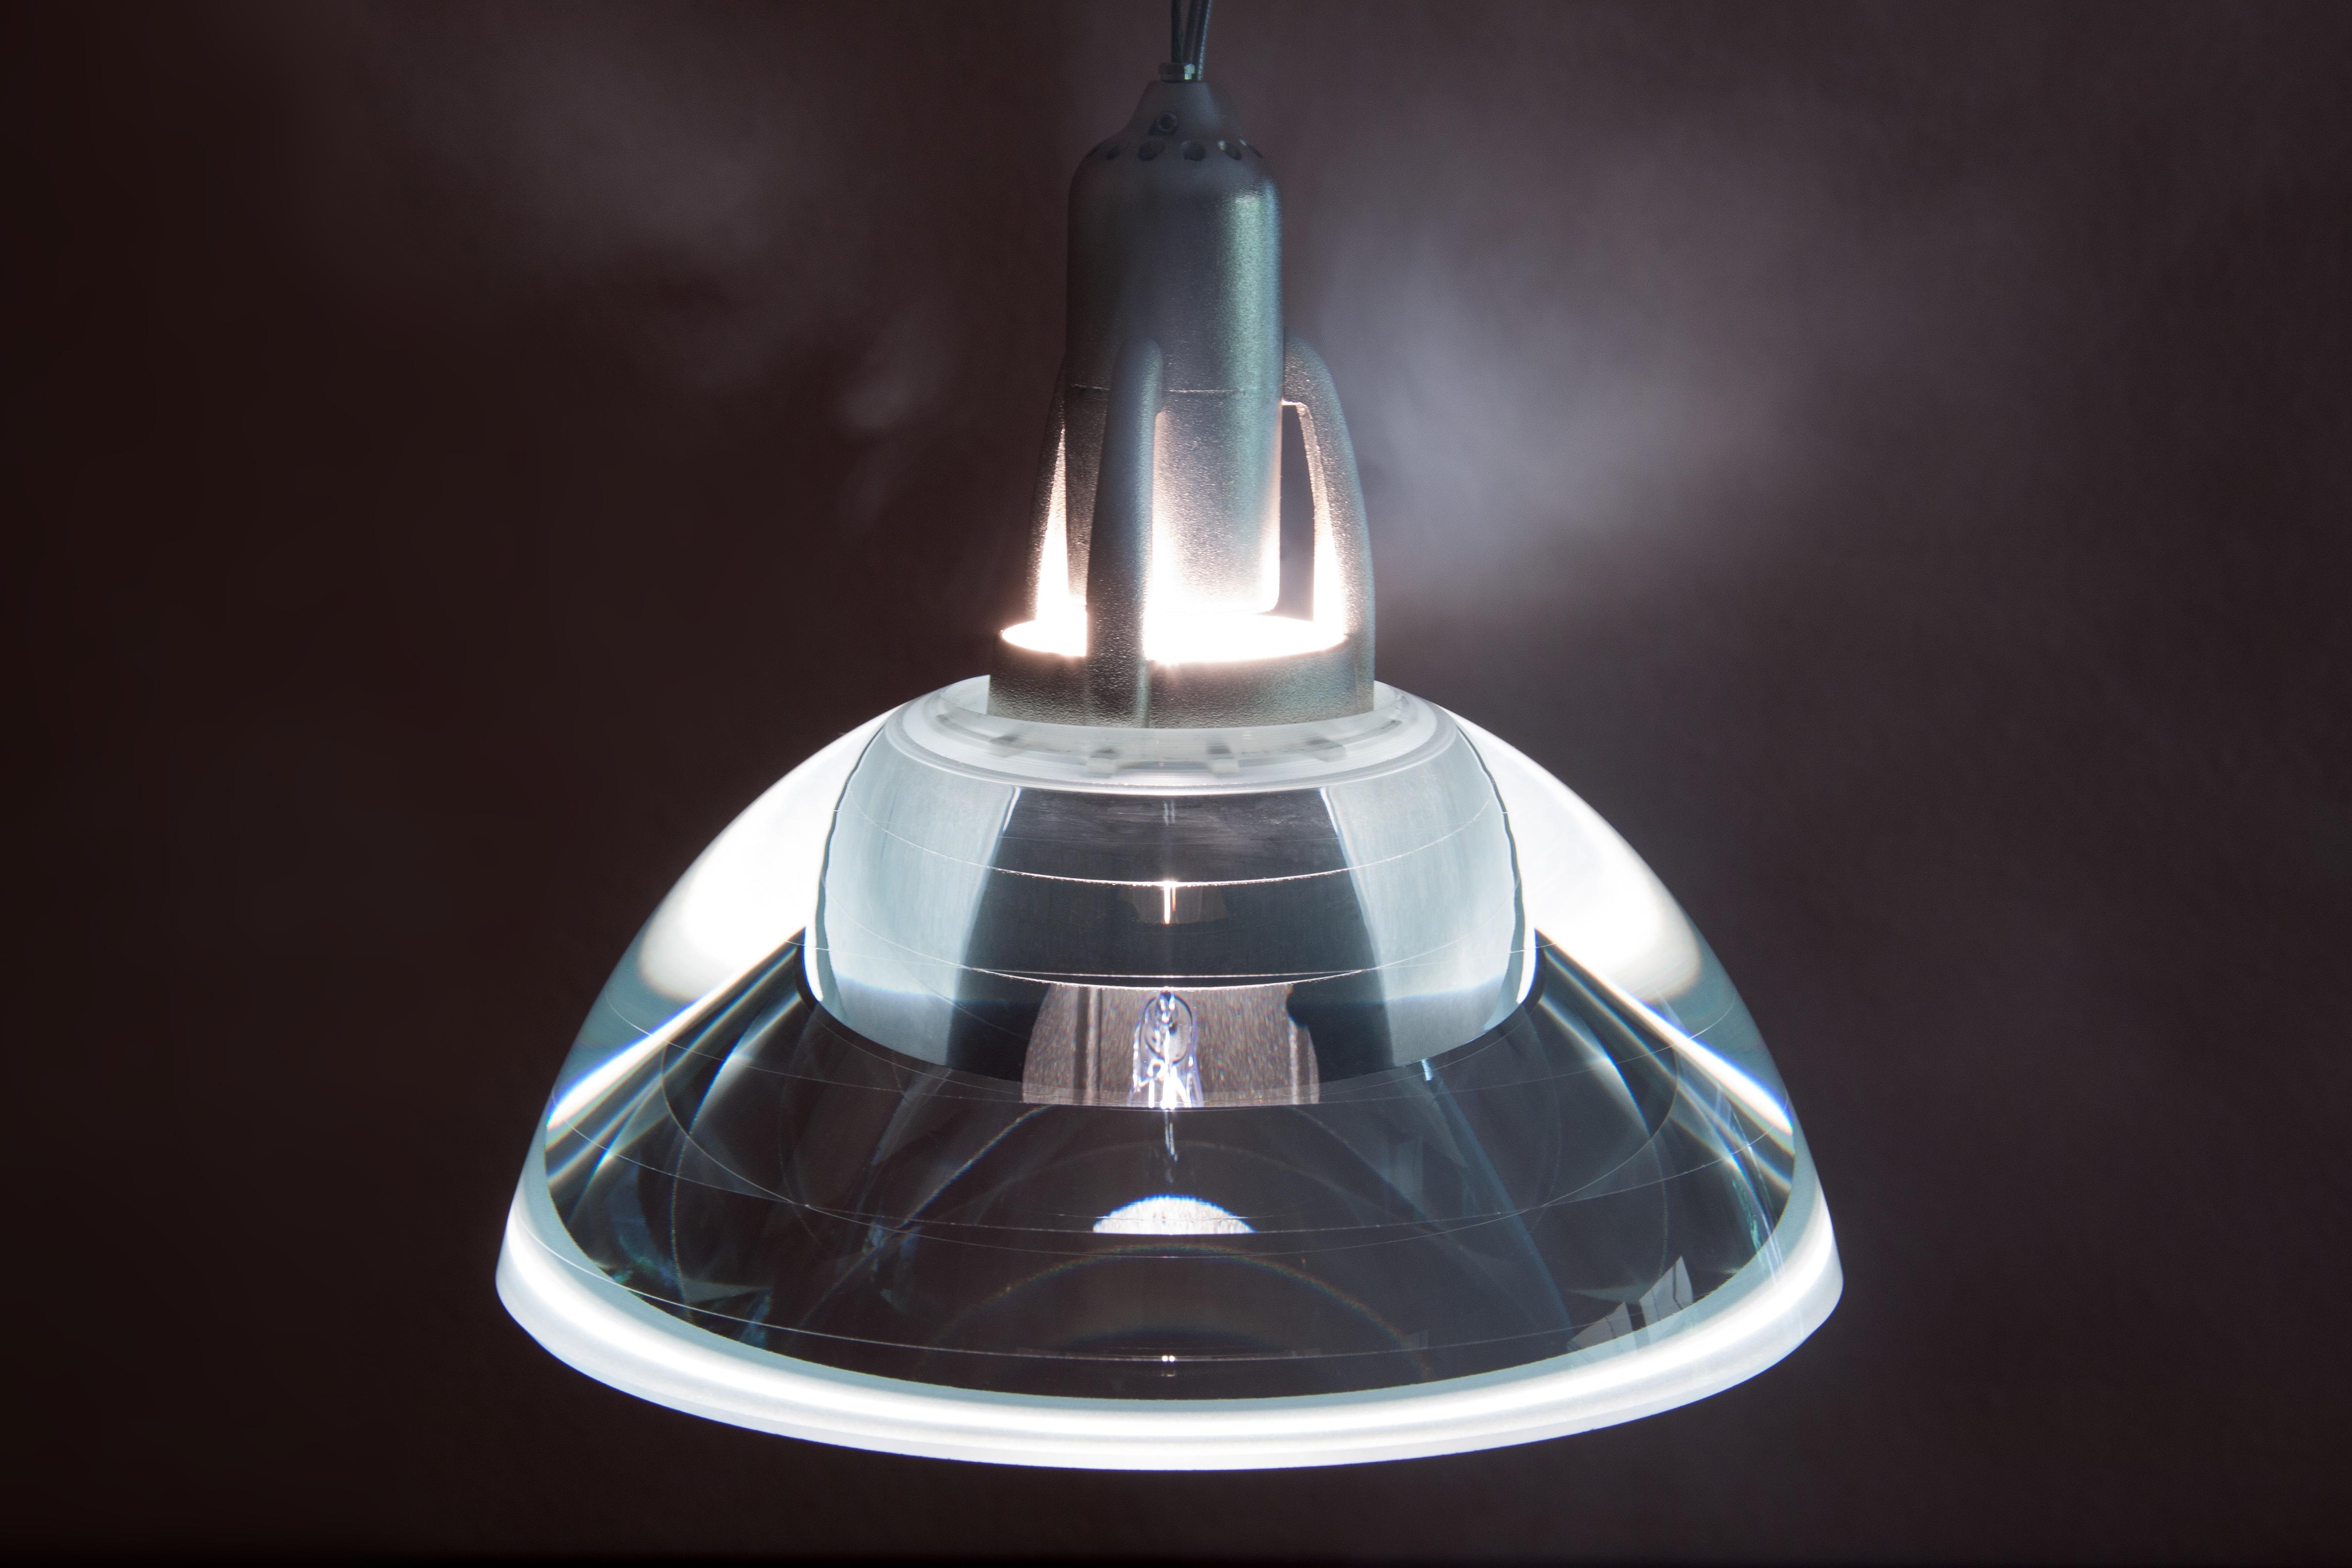 Free Images : ceiling, lighting, futuristic, place, design, bright ...